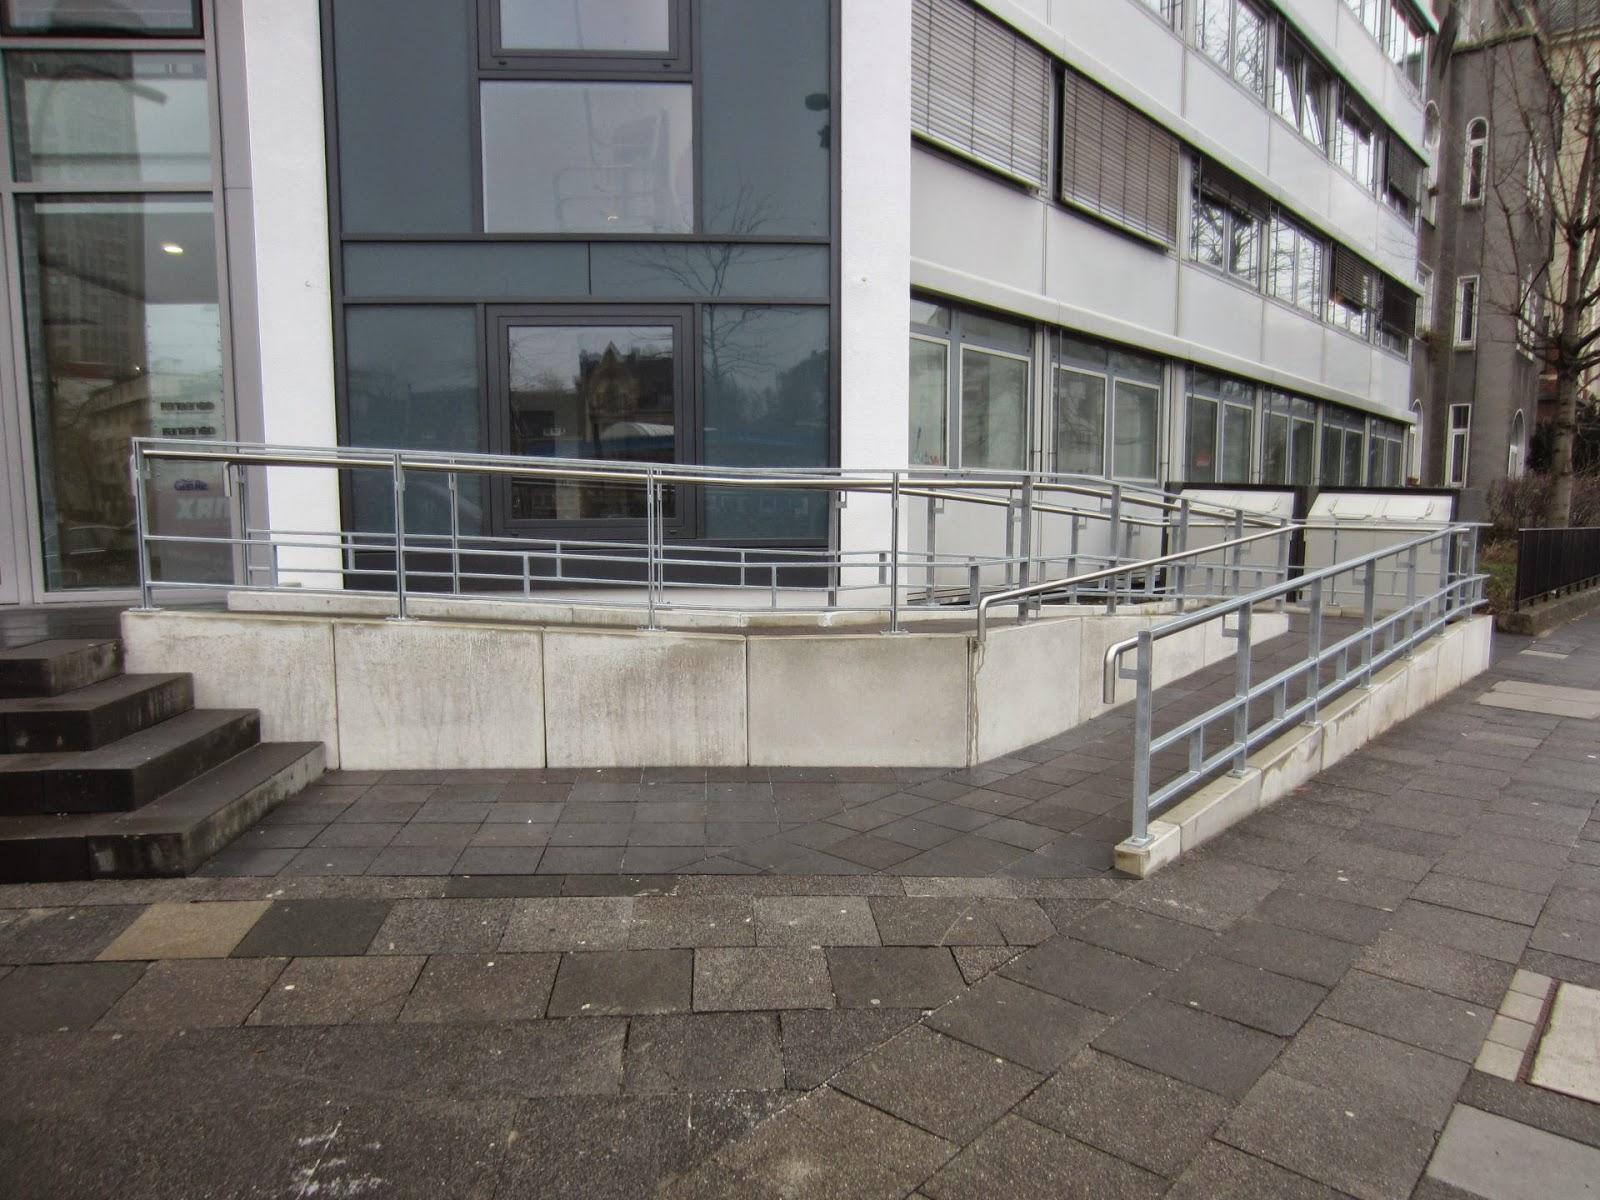 Gel nder rollstuhlrampe fr bel metallbau - Treppe rampe fur rollstuhl ...